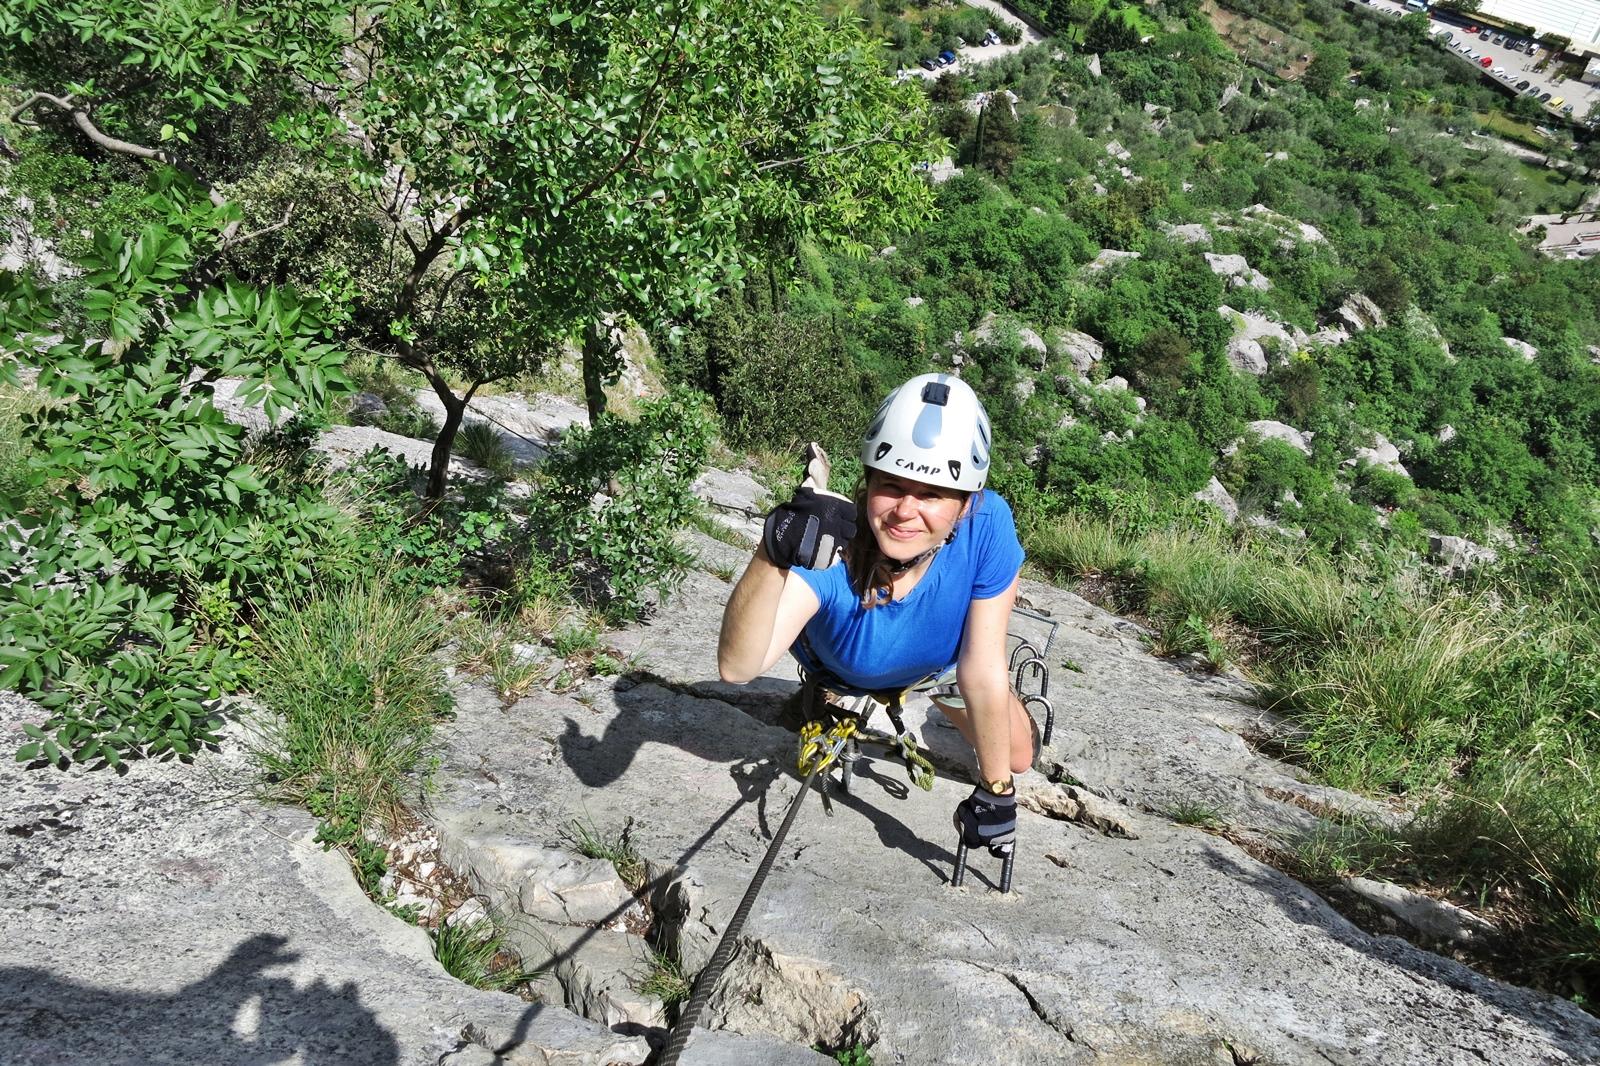 Klettersteig Via Ferrata : Cornillon via ferrata near aix les bains lake perfect for beginners